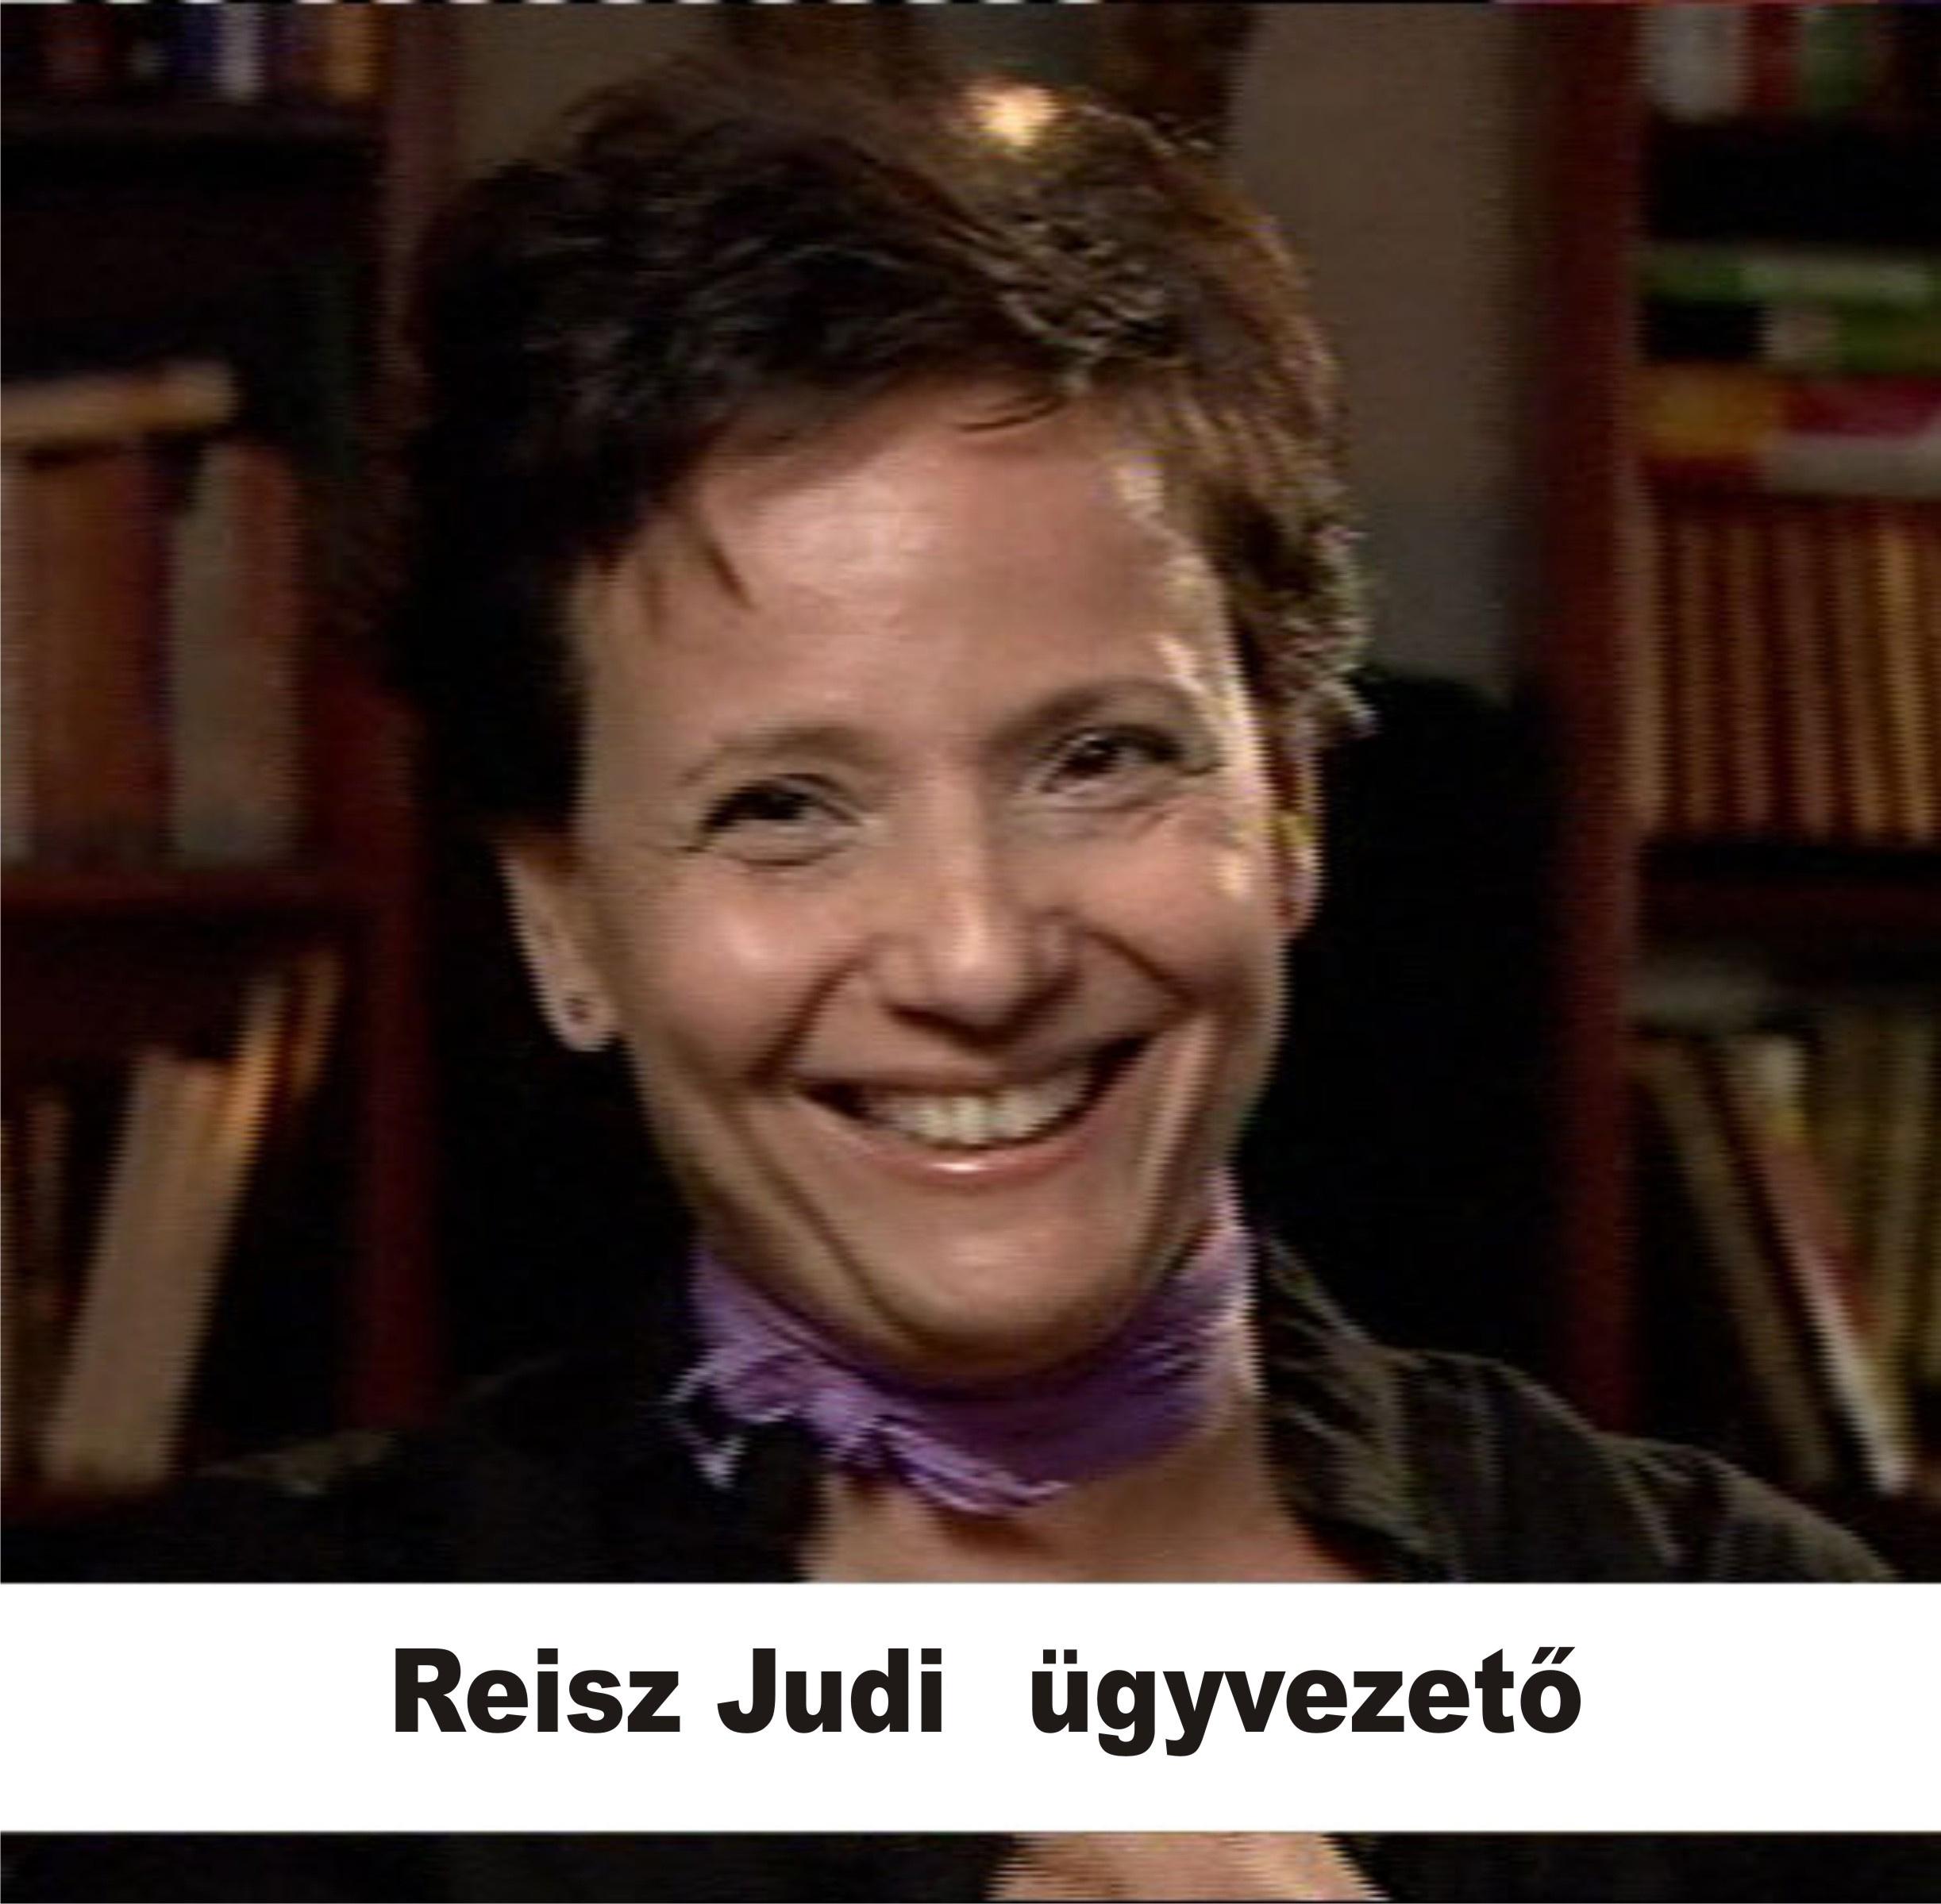 Reisz Judit